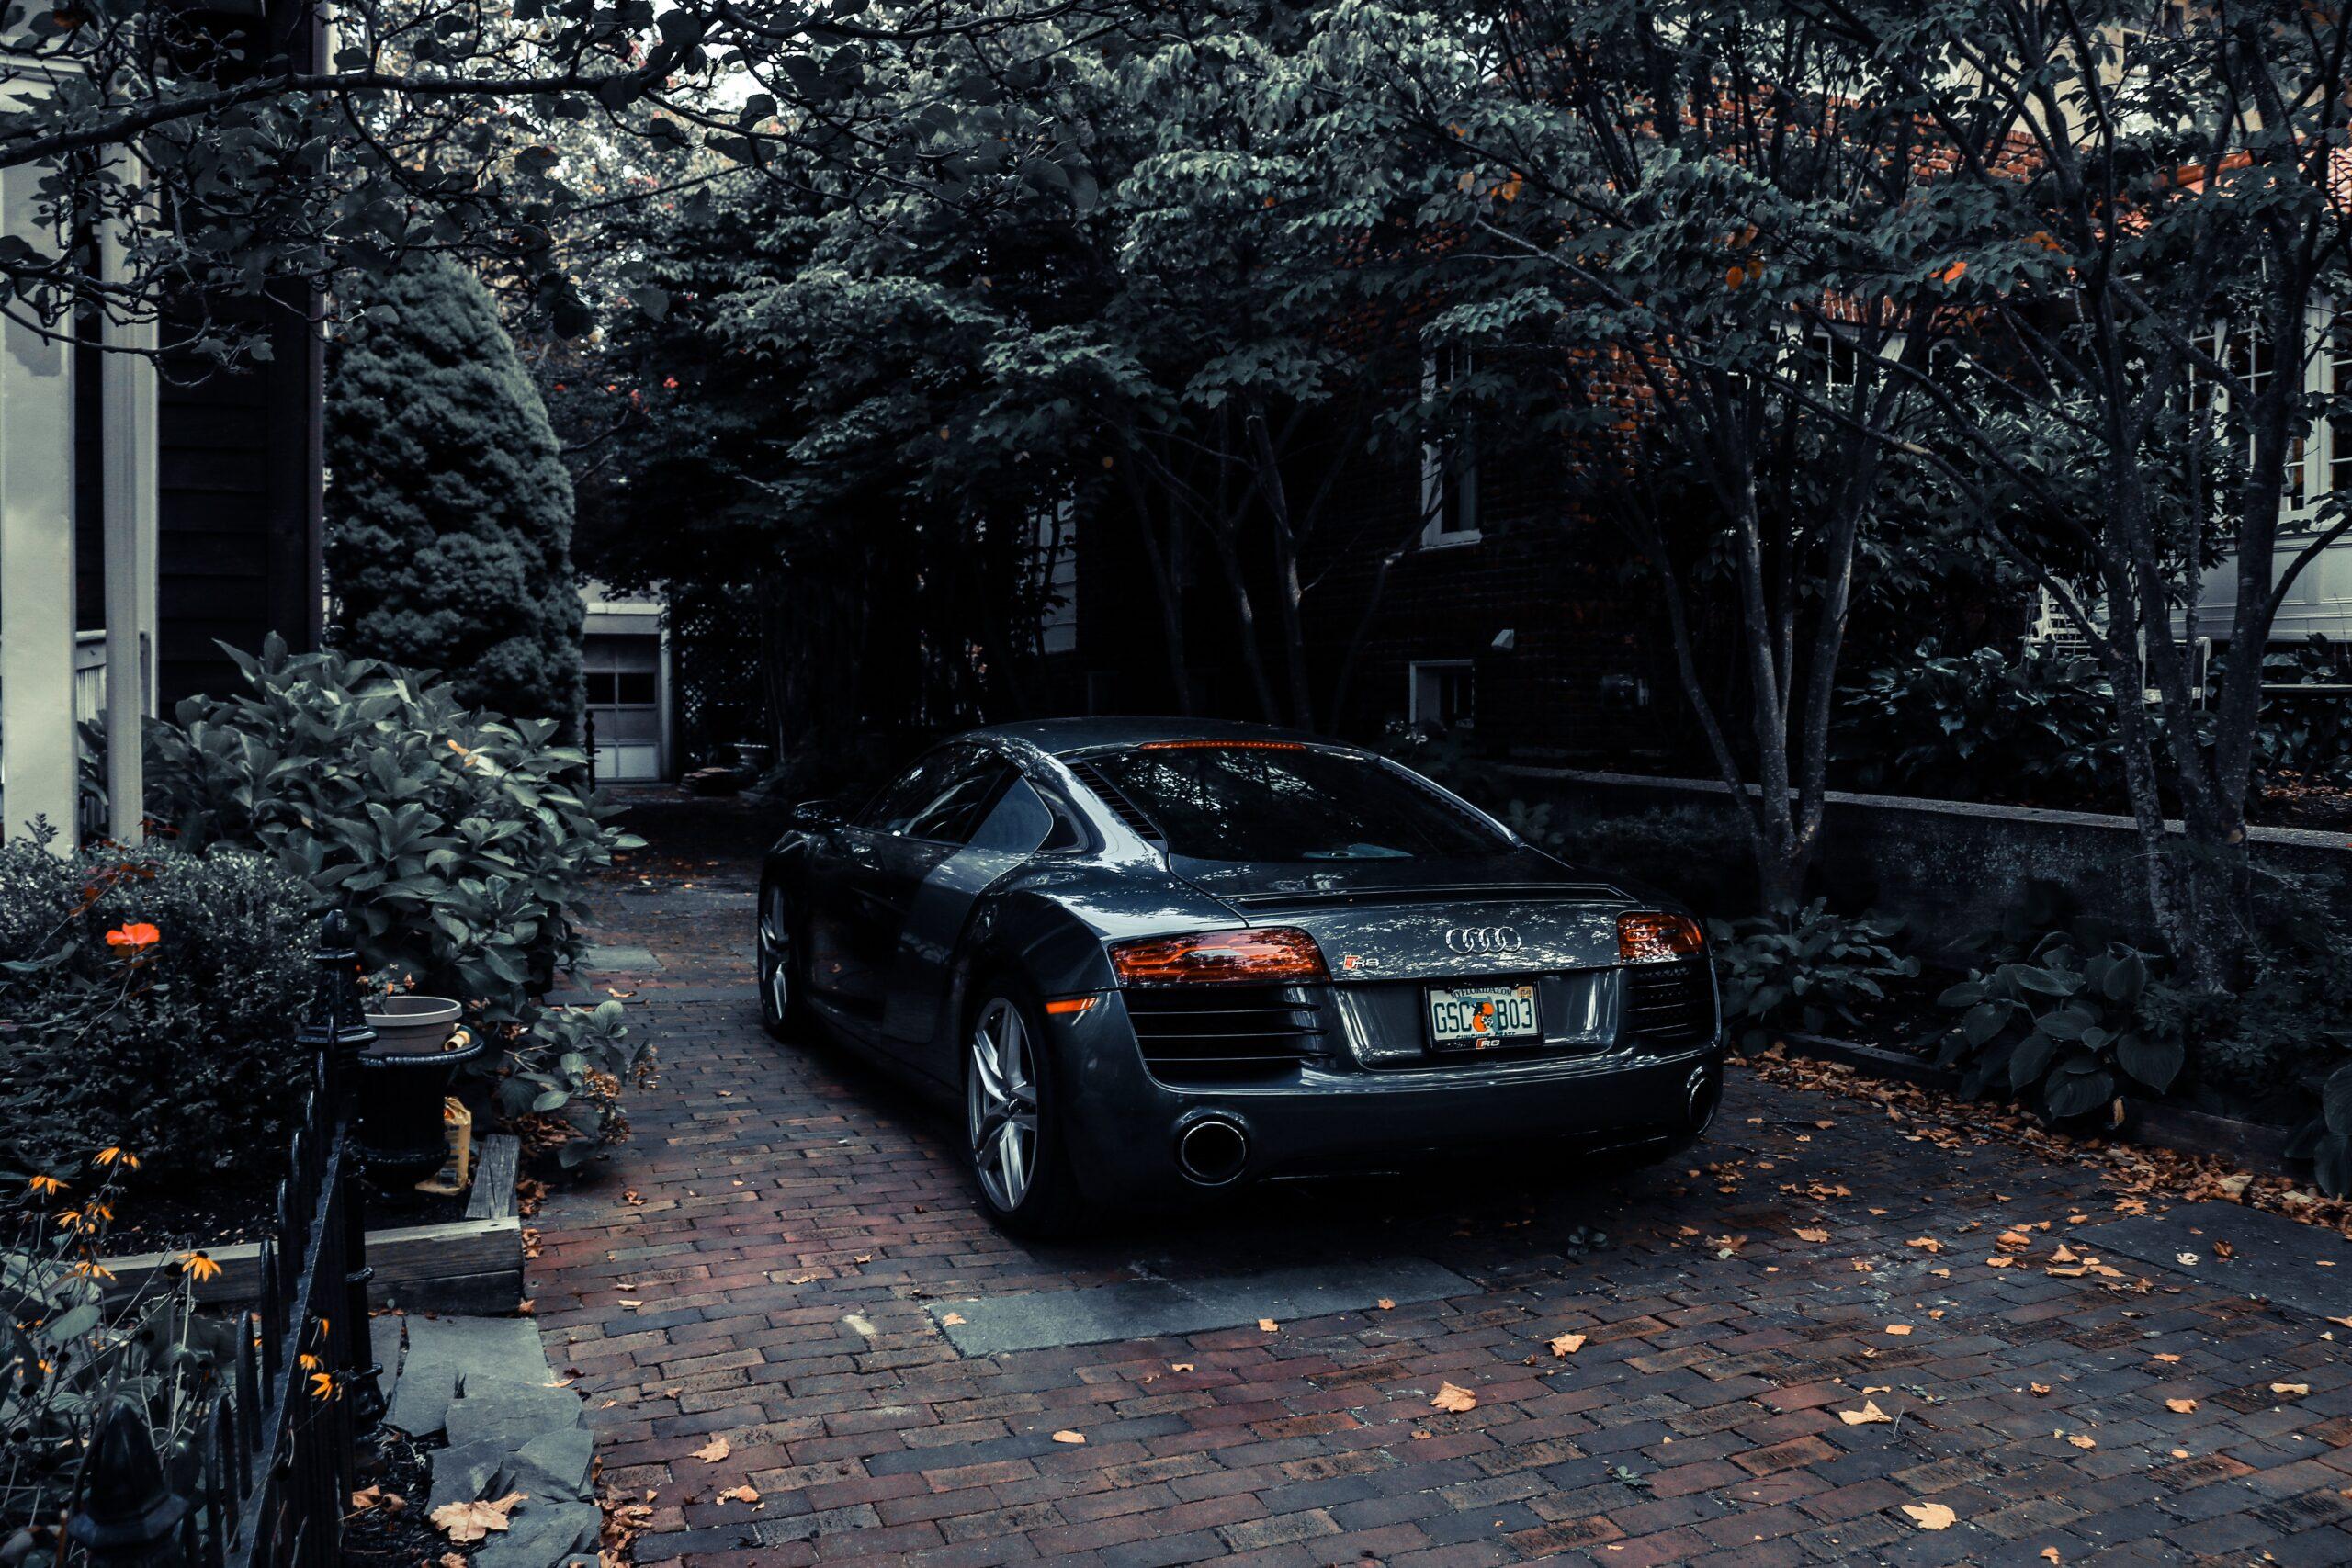 zakup nowego samochodu